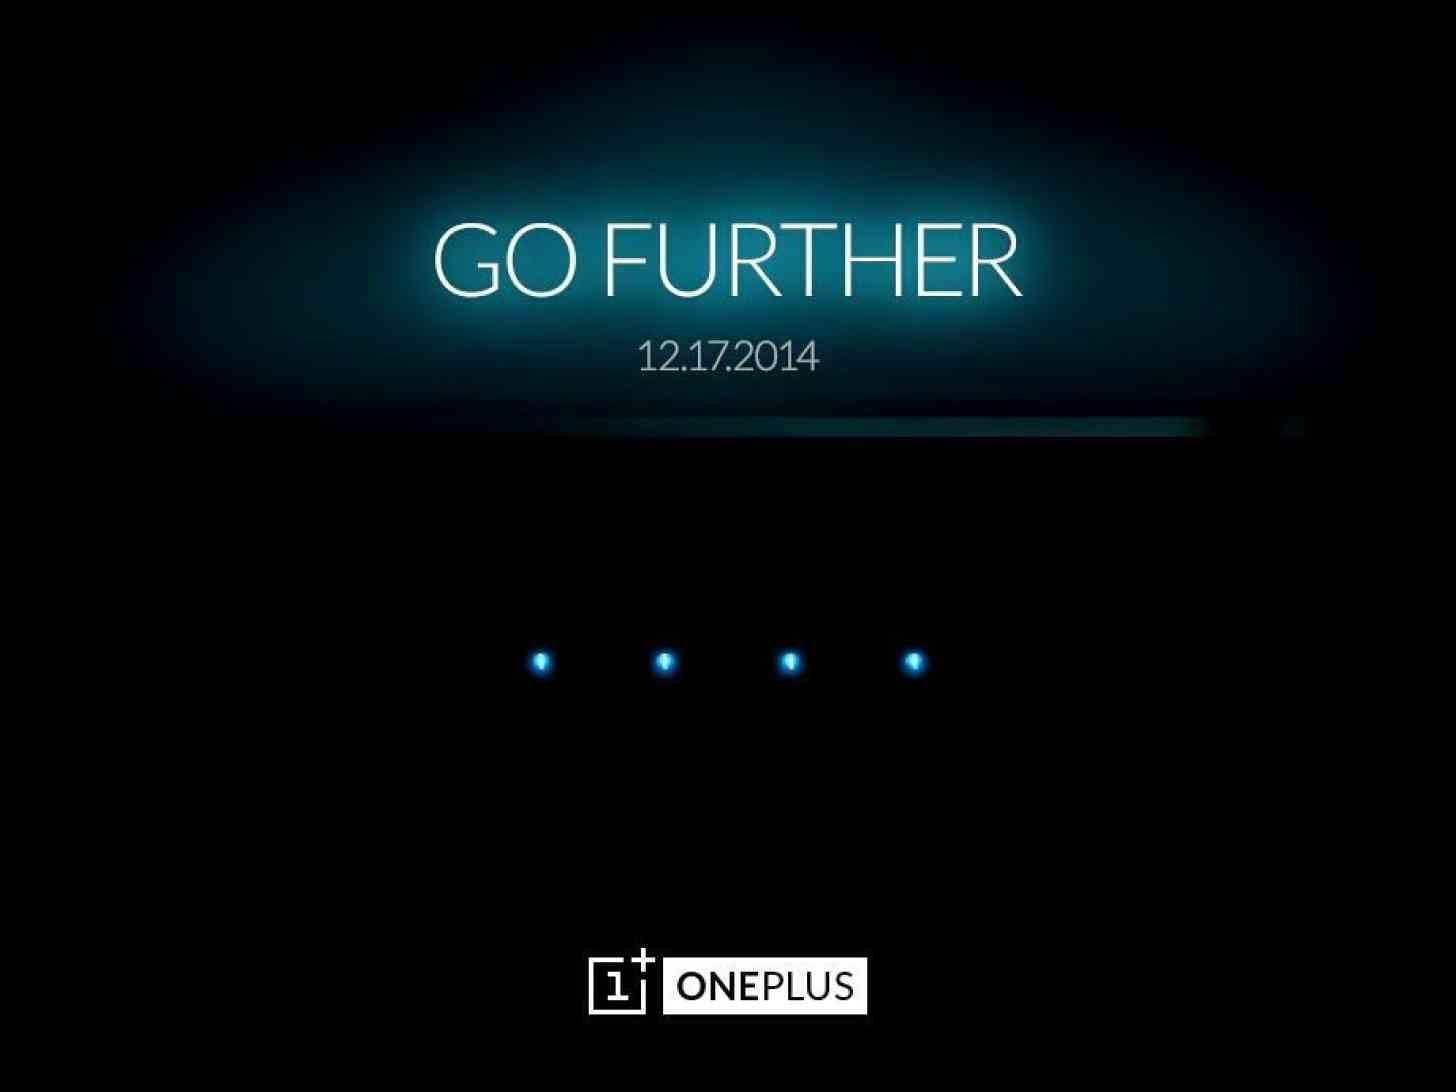 OnePlus December 17 Go Further teaser